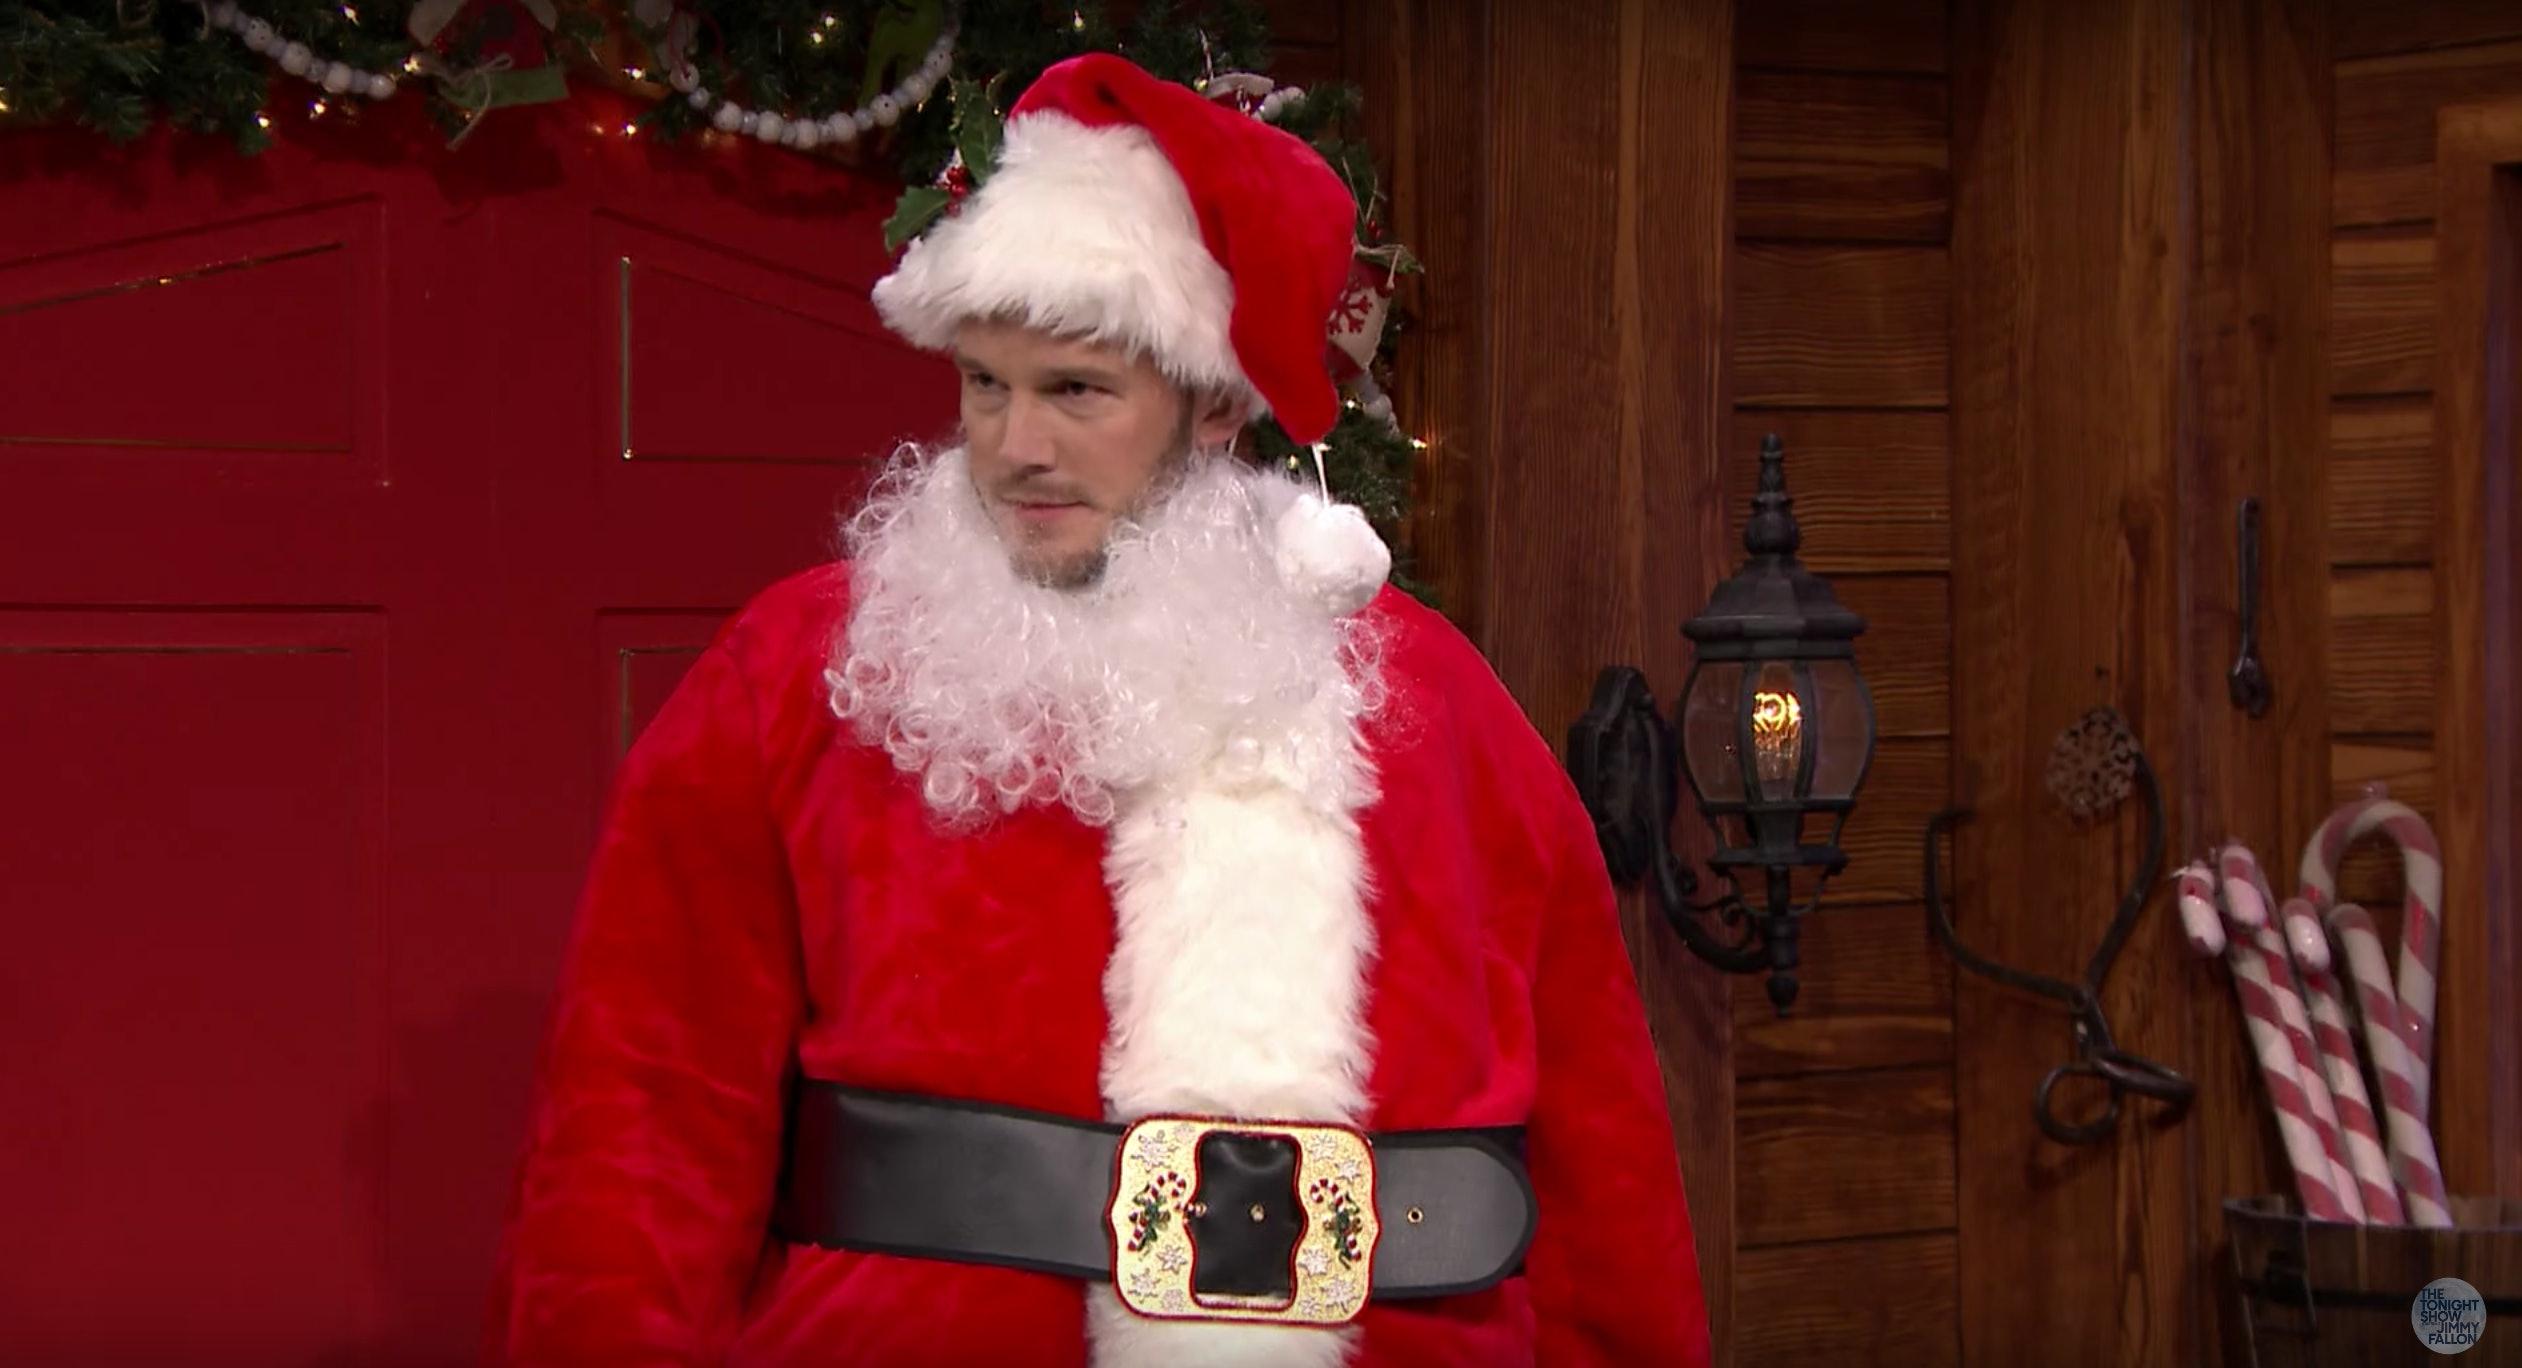 chris pratt dresses like santa claus to do christmas mad libs